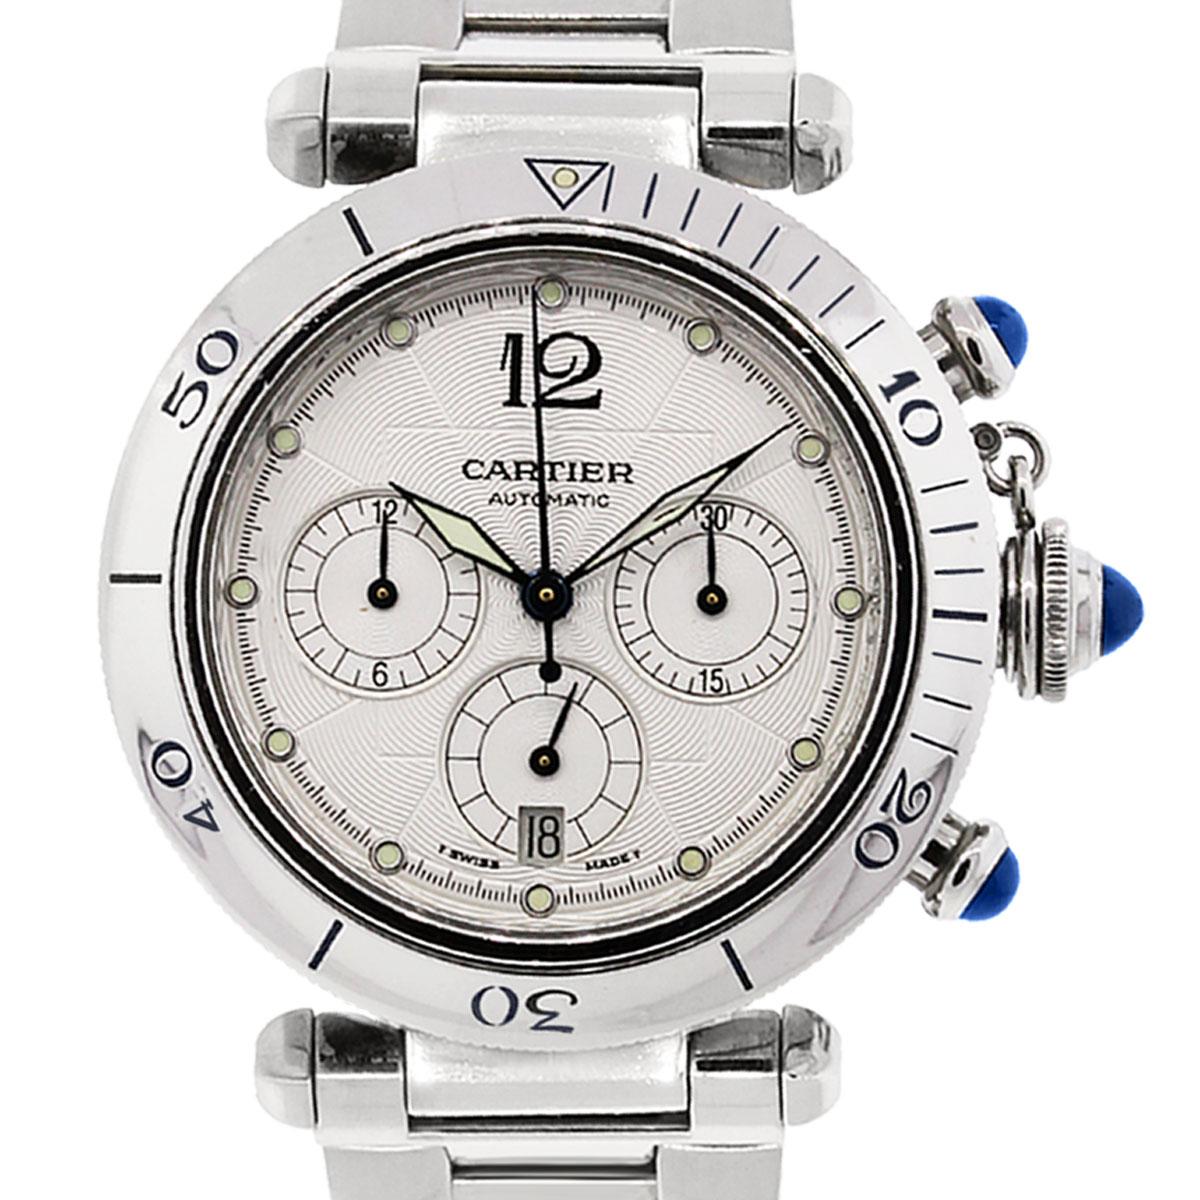 Cartier Pasha 2113 Chronograph Dial Skeleton Back Watch